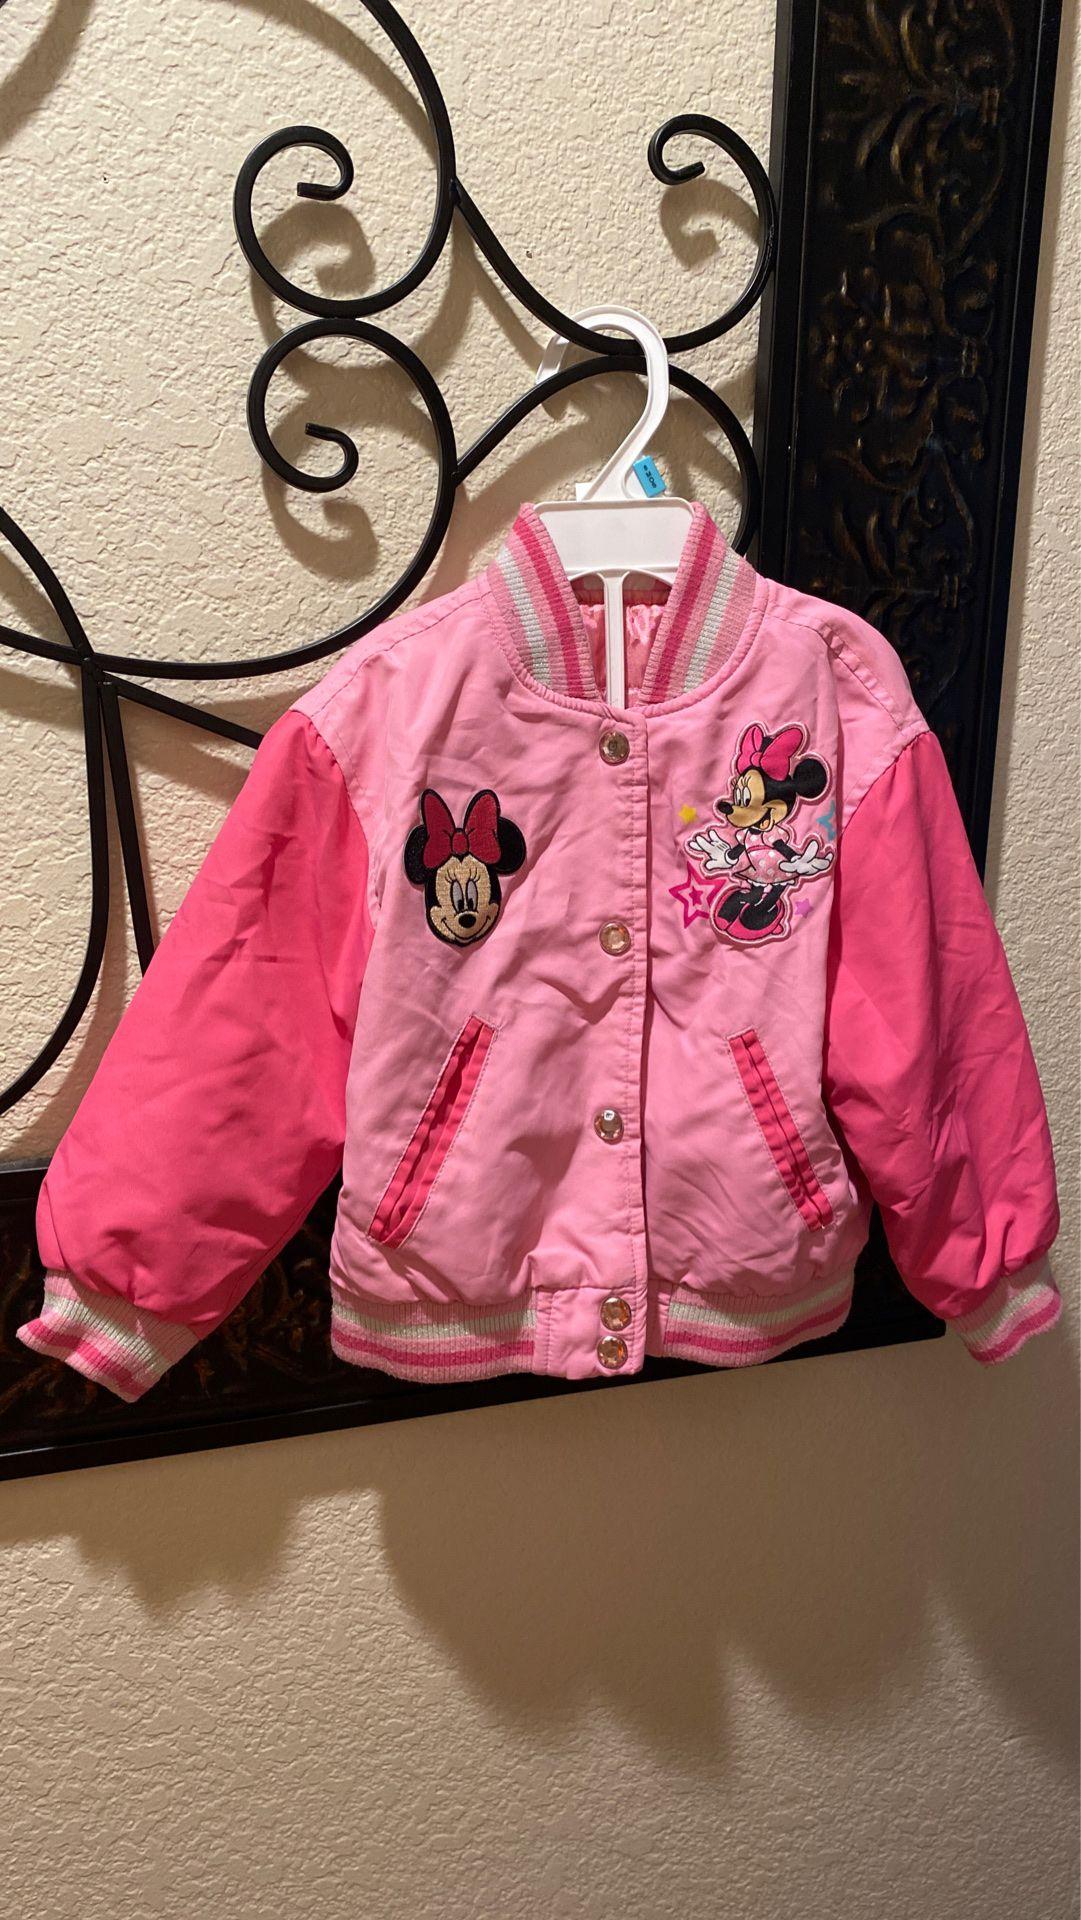 Toddler girl jacket size 2T